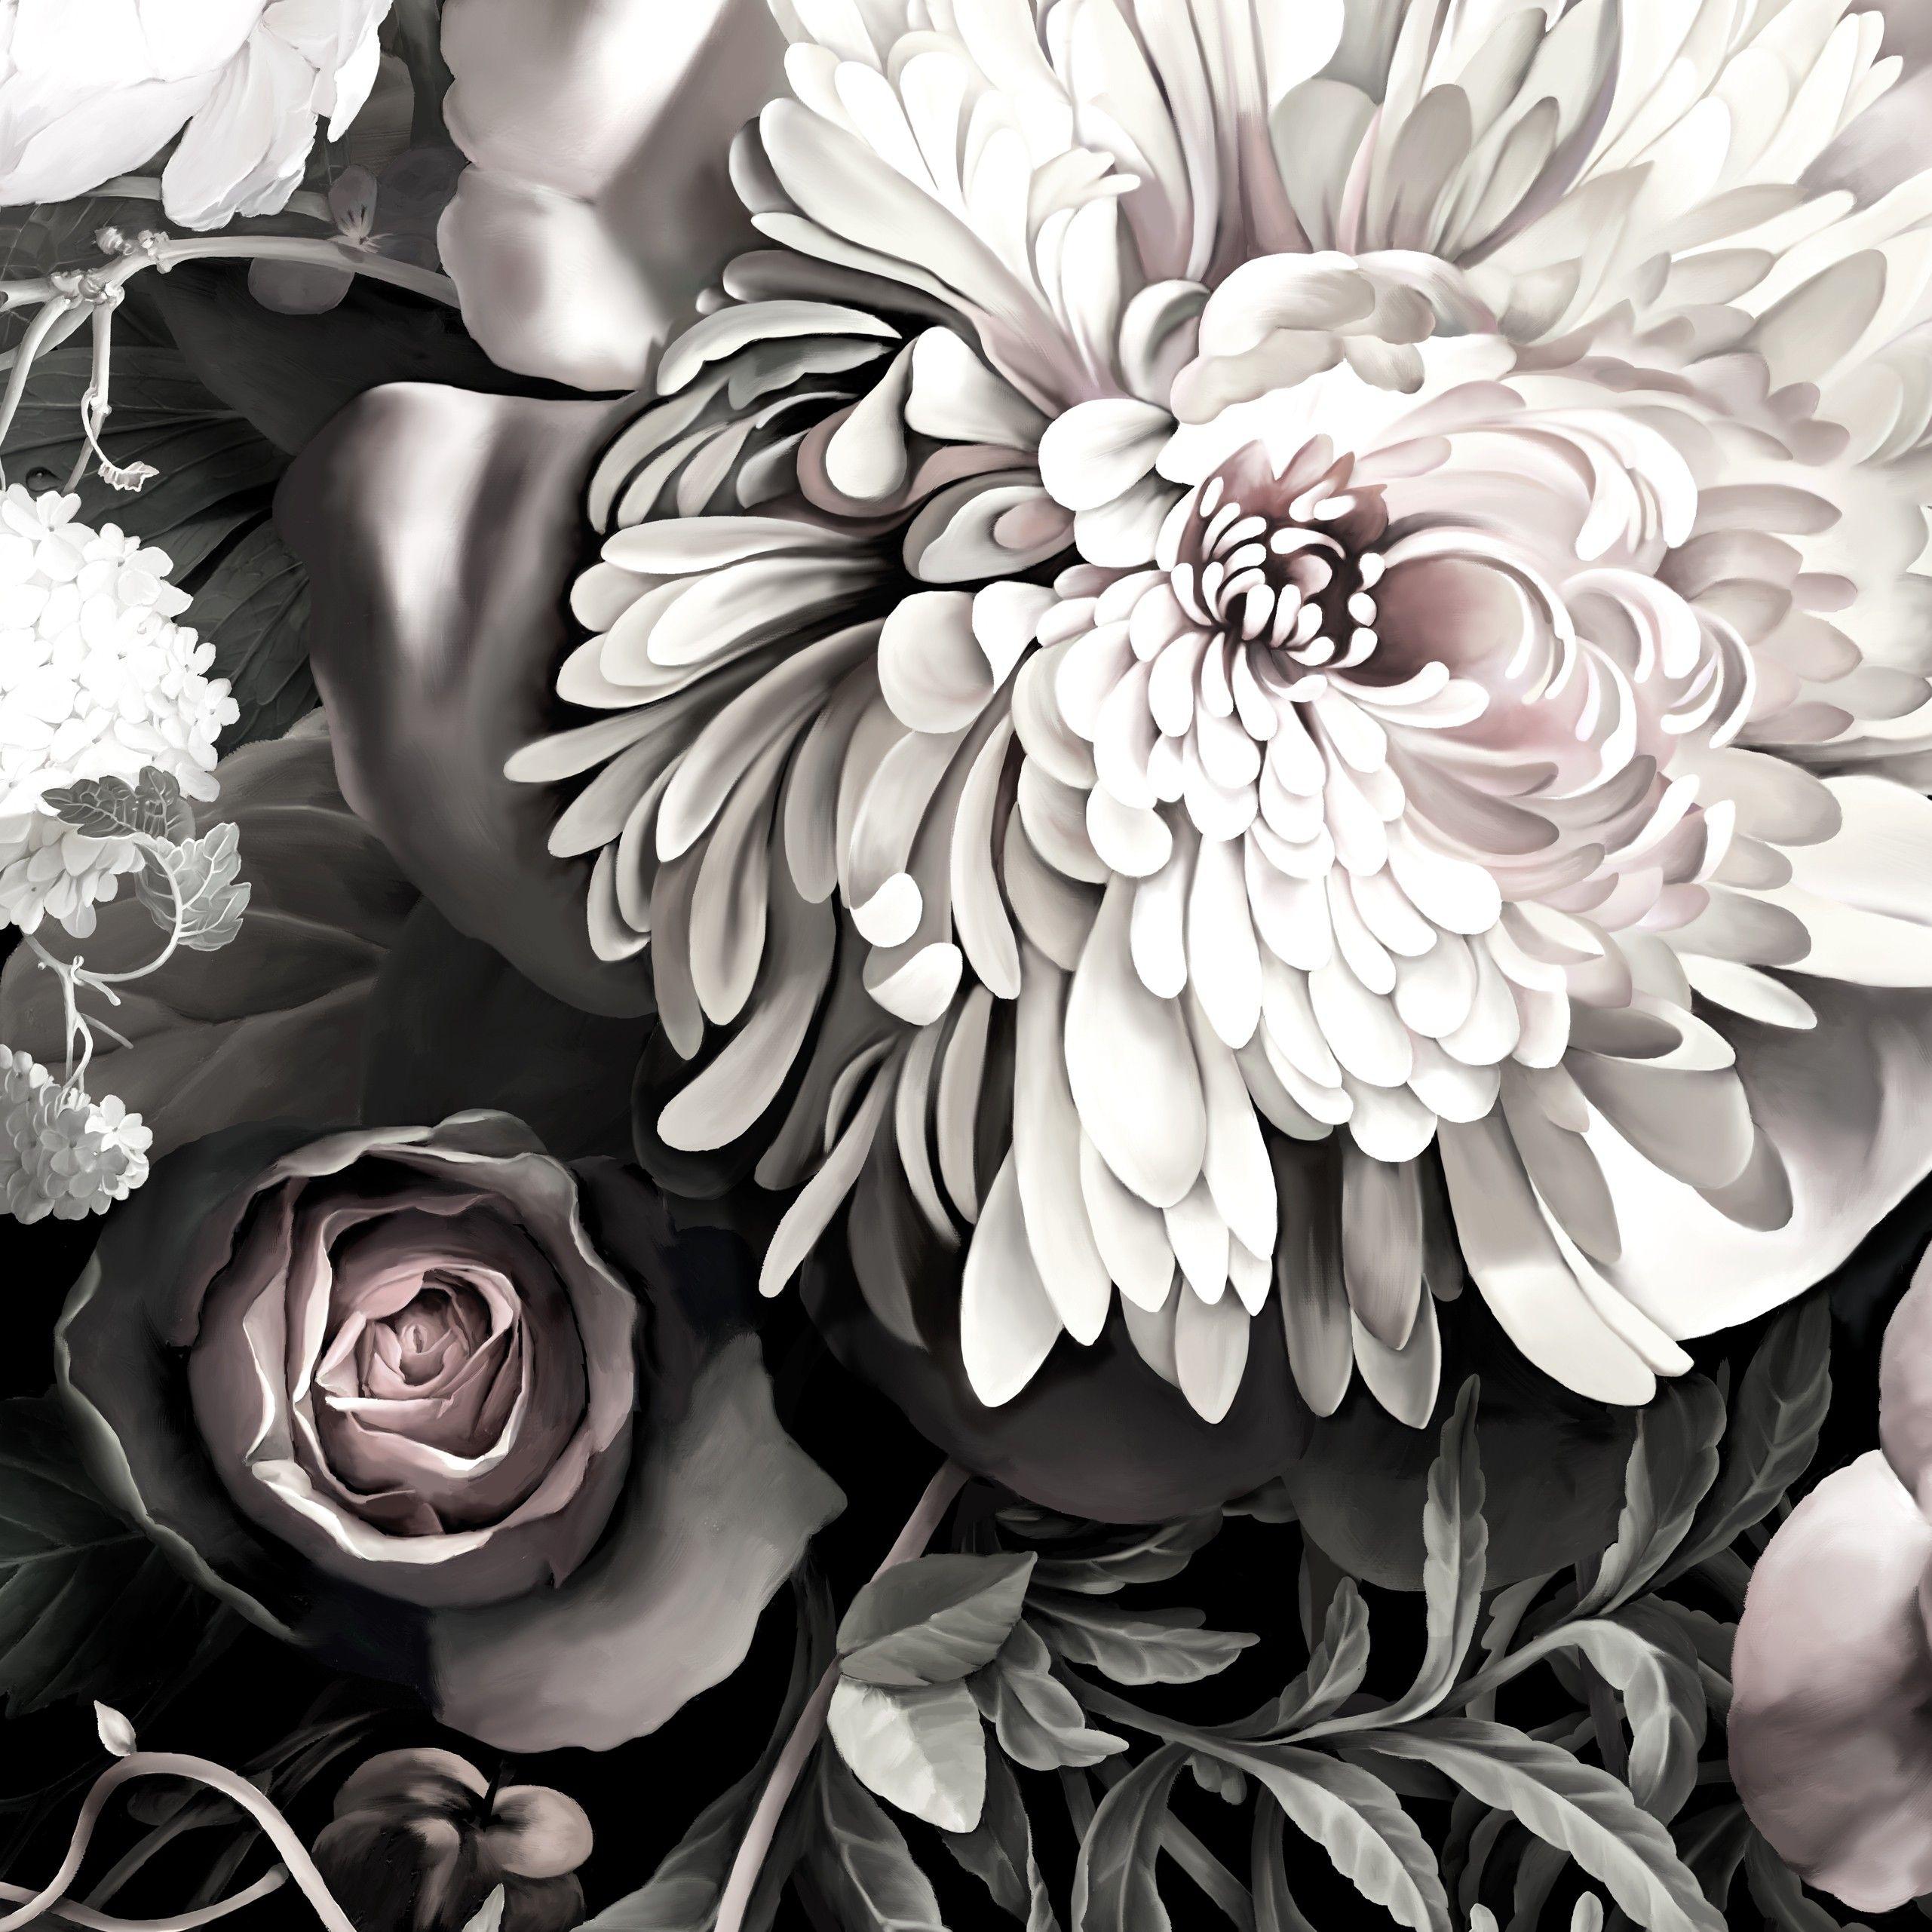 Black floral print wallpaper dark floral wallpaper by ellie cashman - Dark Floral Ii Black Desaturated Sample Floral Wallpaper Samples By Ellie Cashman Design